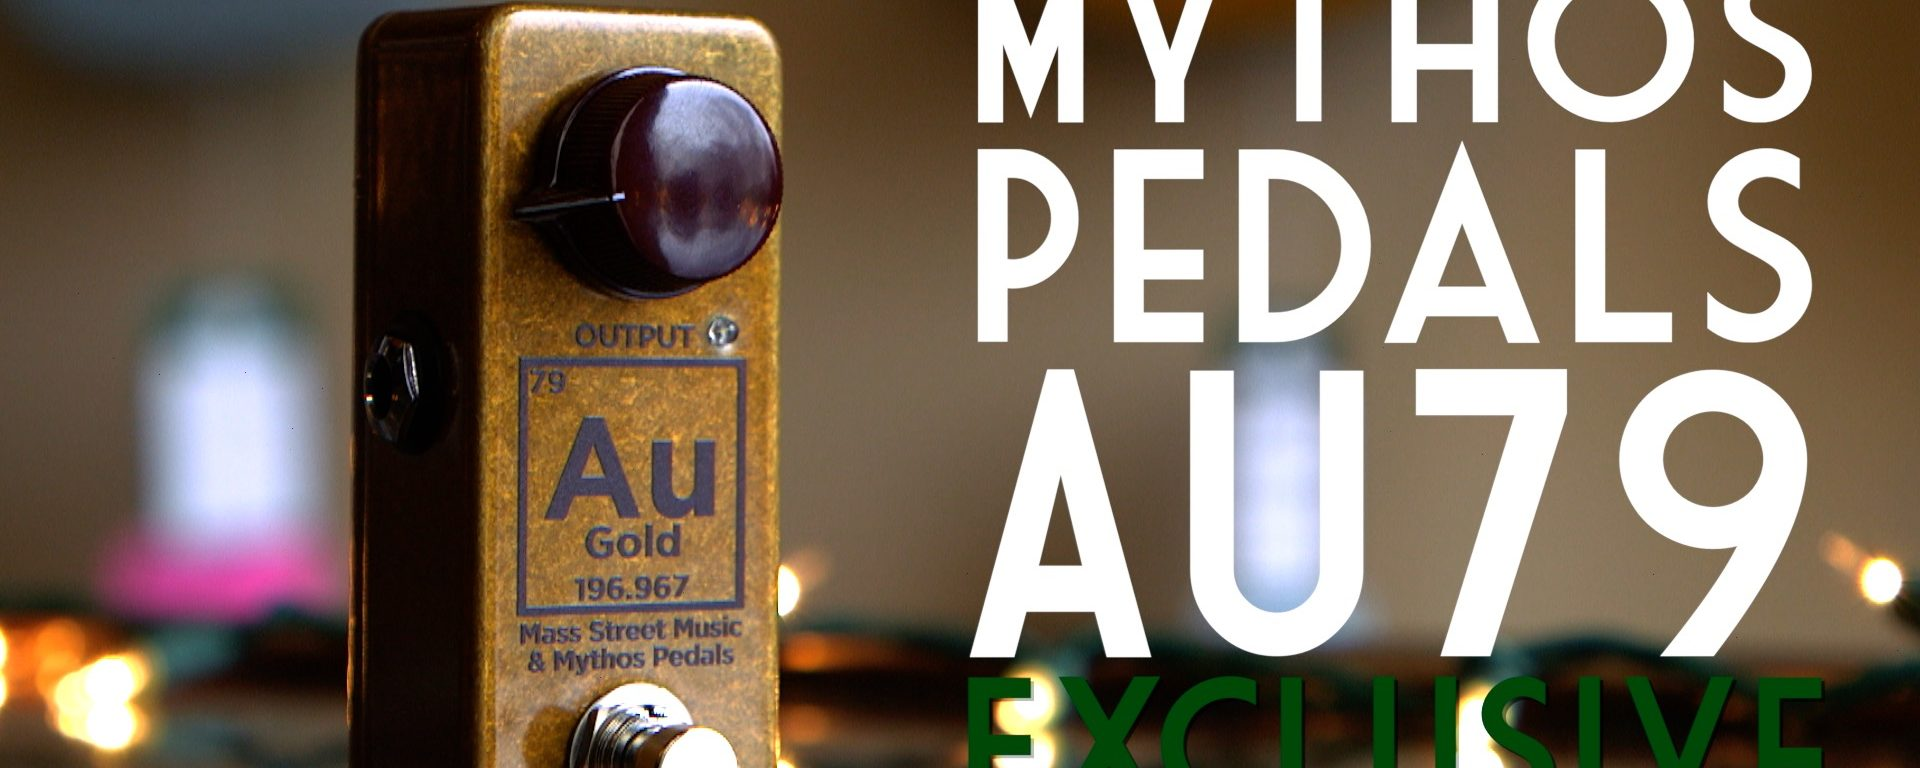 Mythos Pedals Au79